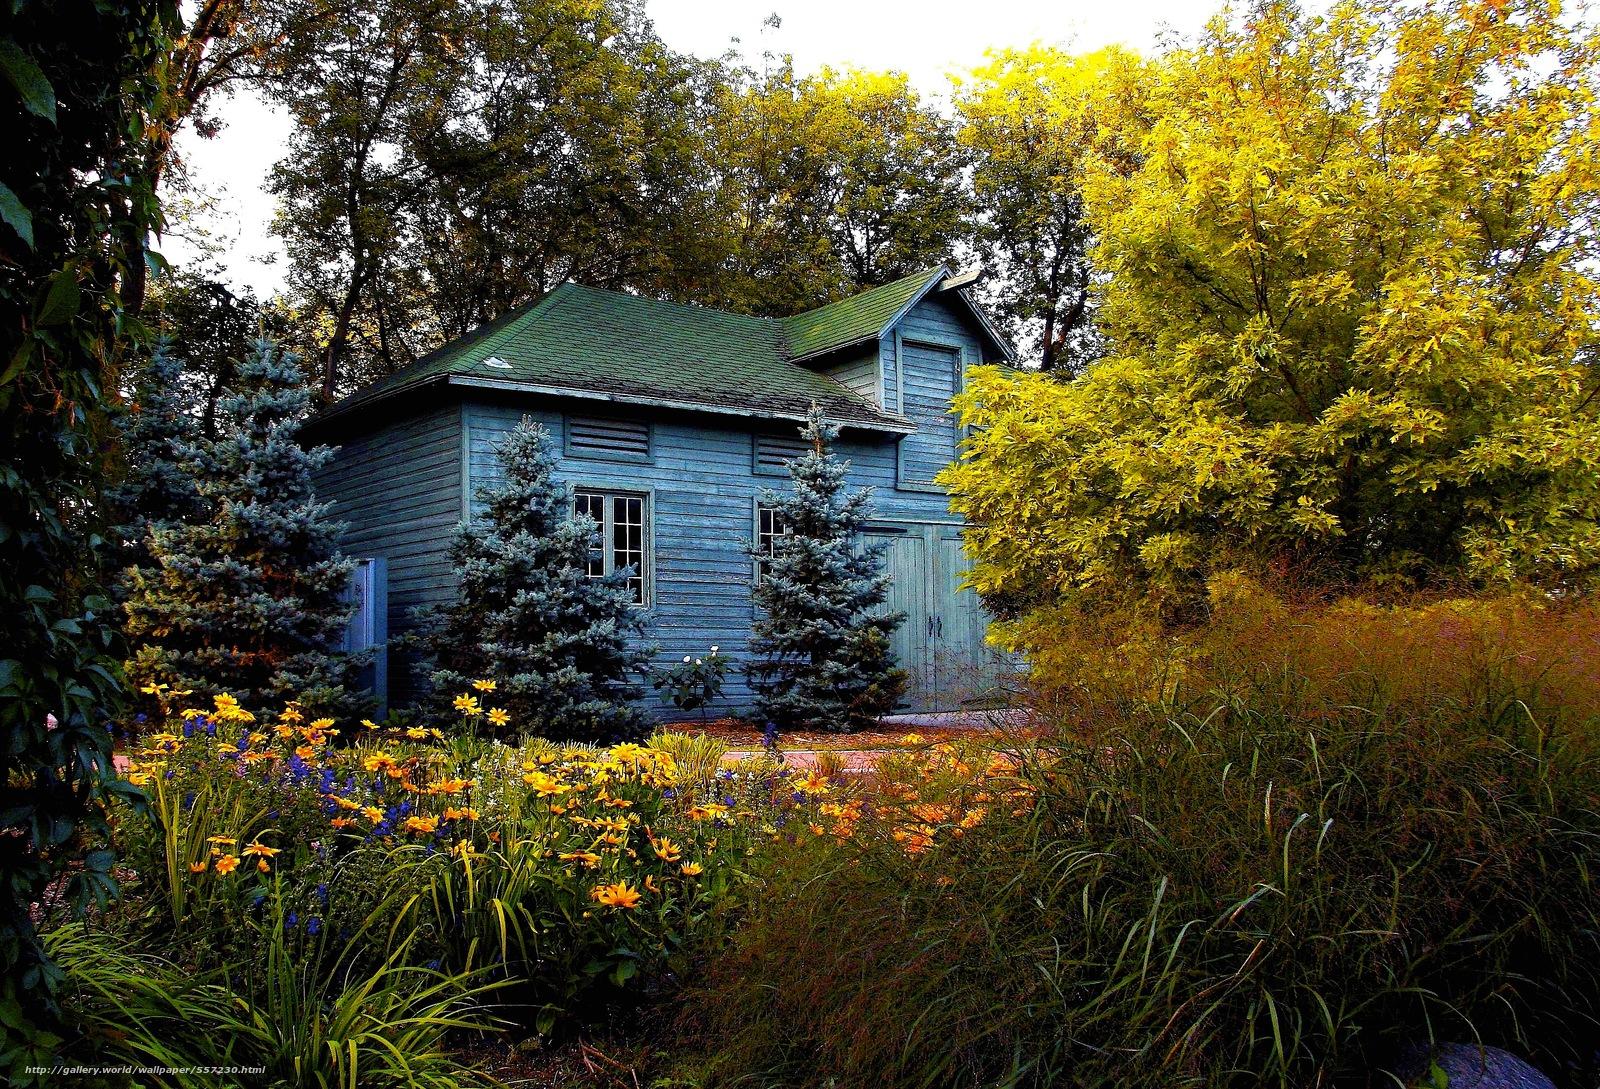 Tlcharger fond d 39 ecran anglais abri de jardin canada maison jardin fonds d 39 ecran gratuits - Fond d ecran jardin anglais ...